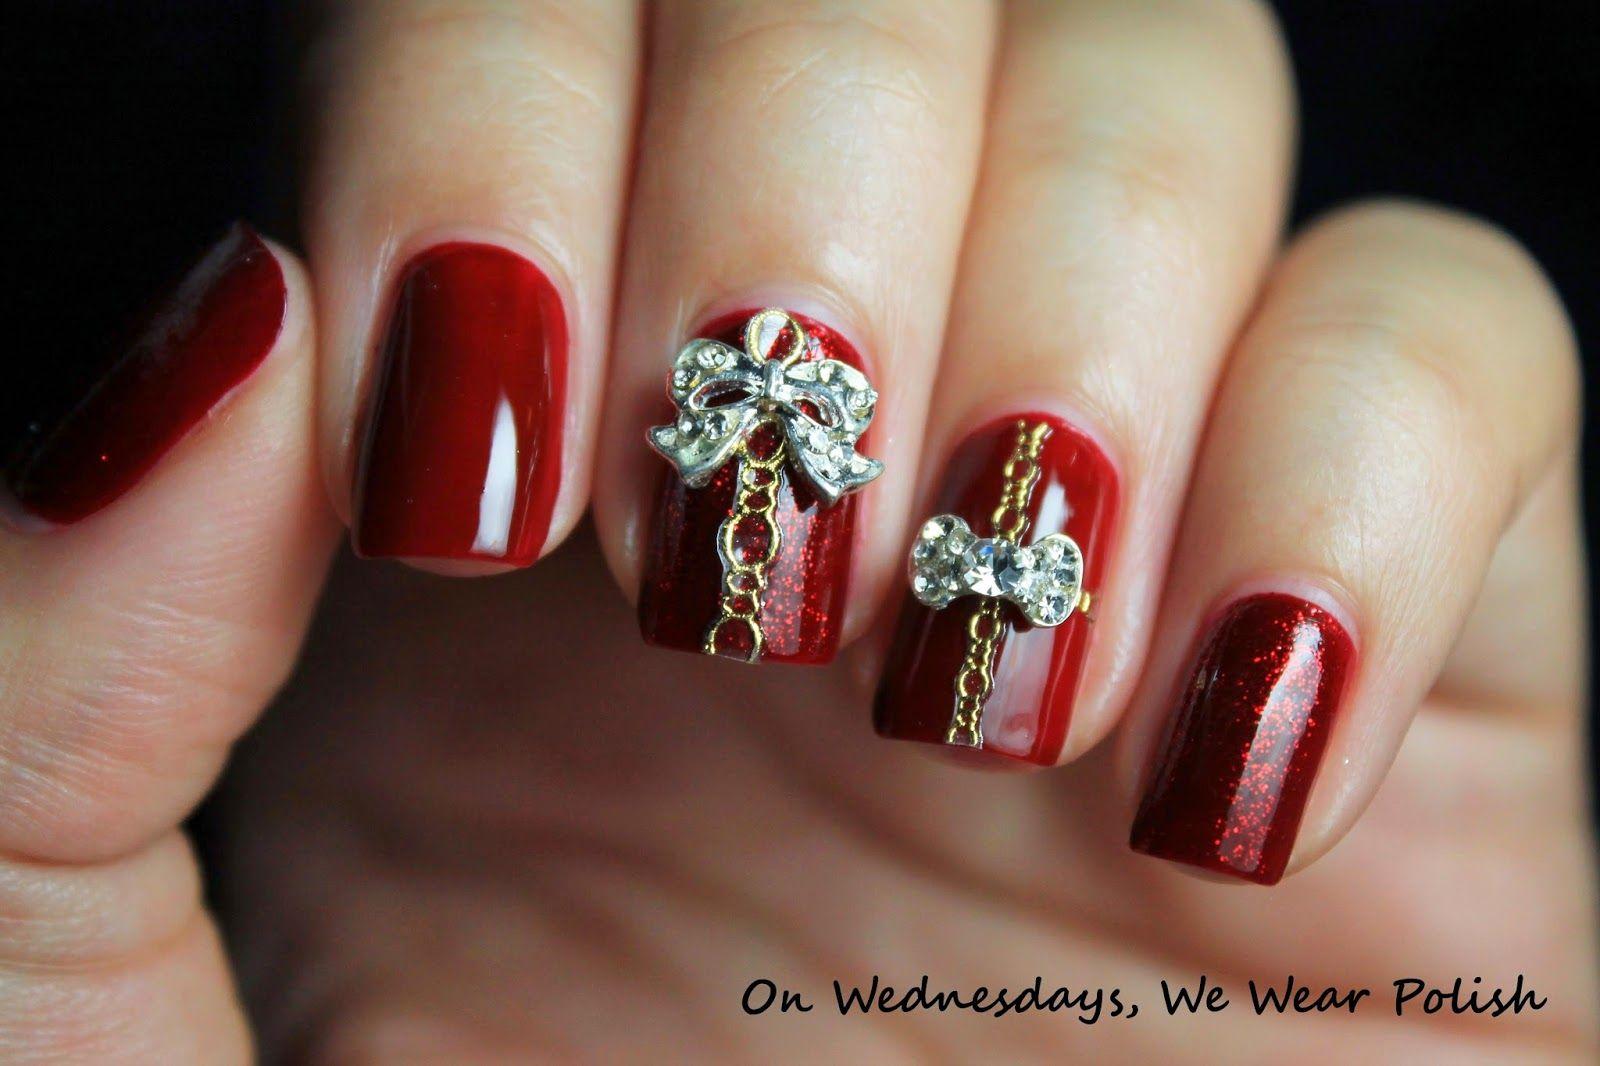 On Wednesdays, We Wear Polish : 'Tis the Season for Holiday Nail Art